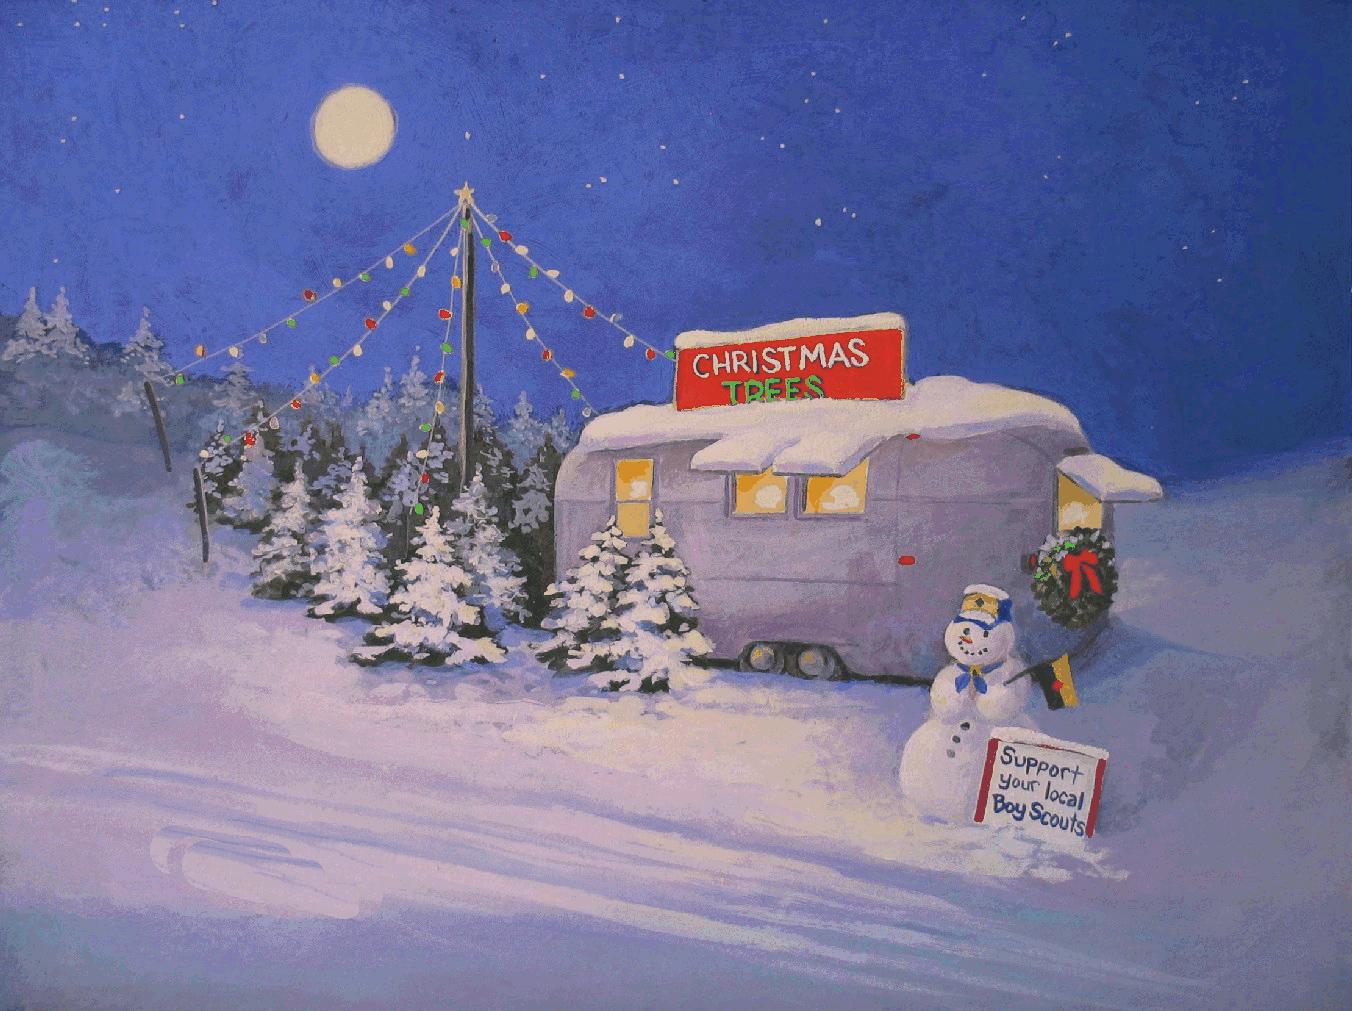 Christmas Desktop Wallpapers Painting For Desktops 1352x1011